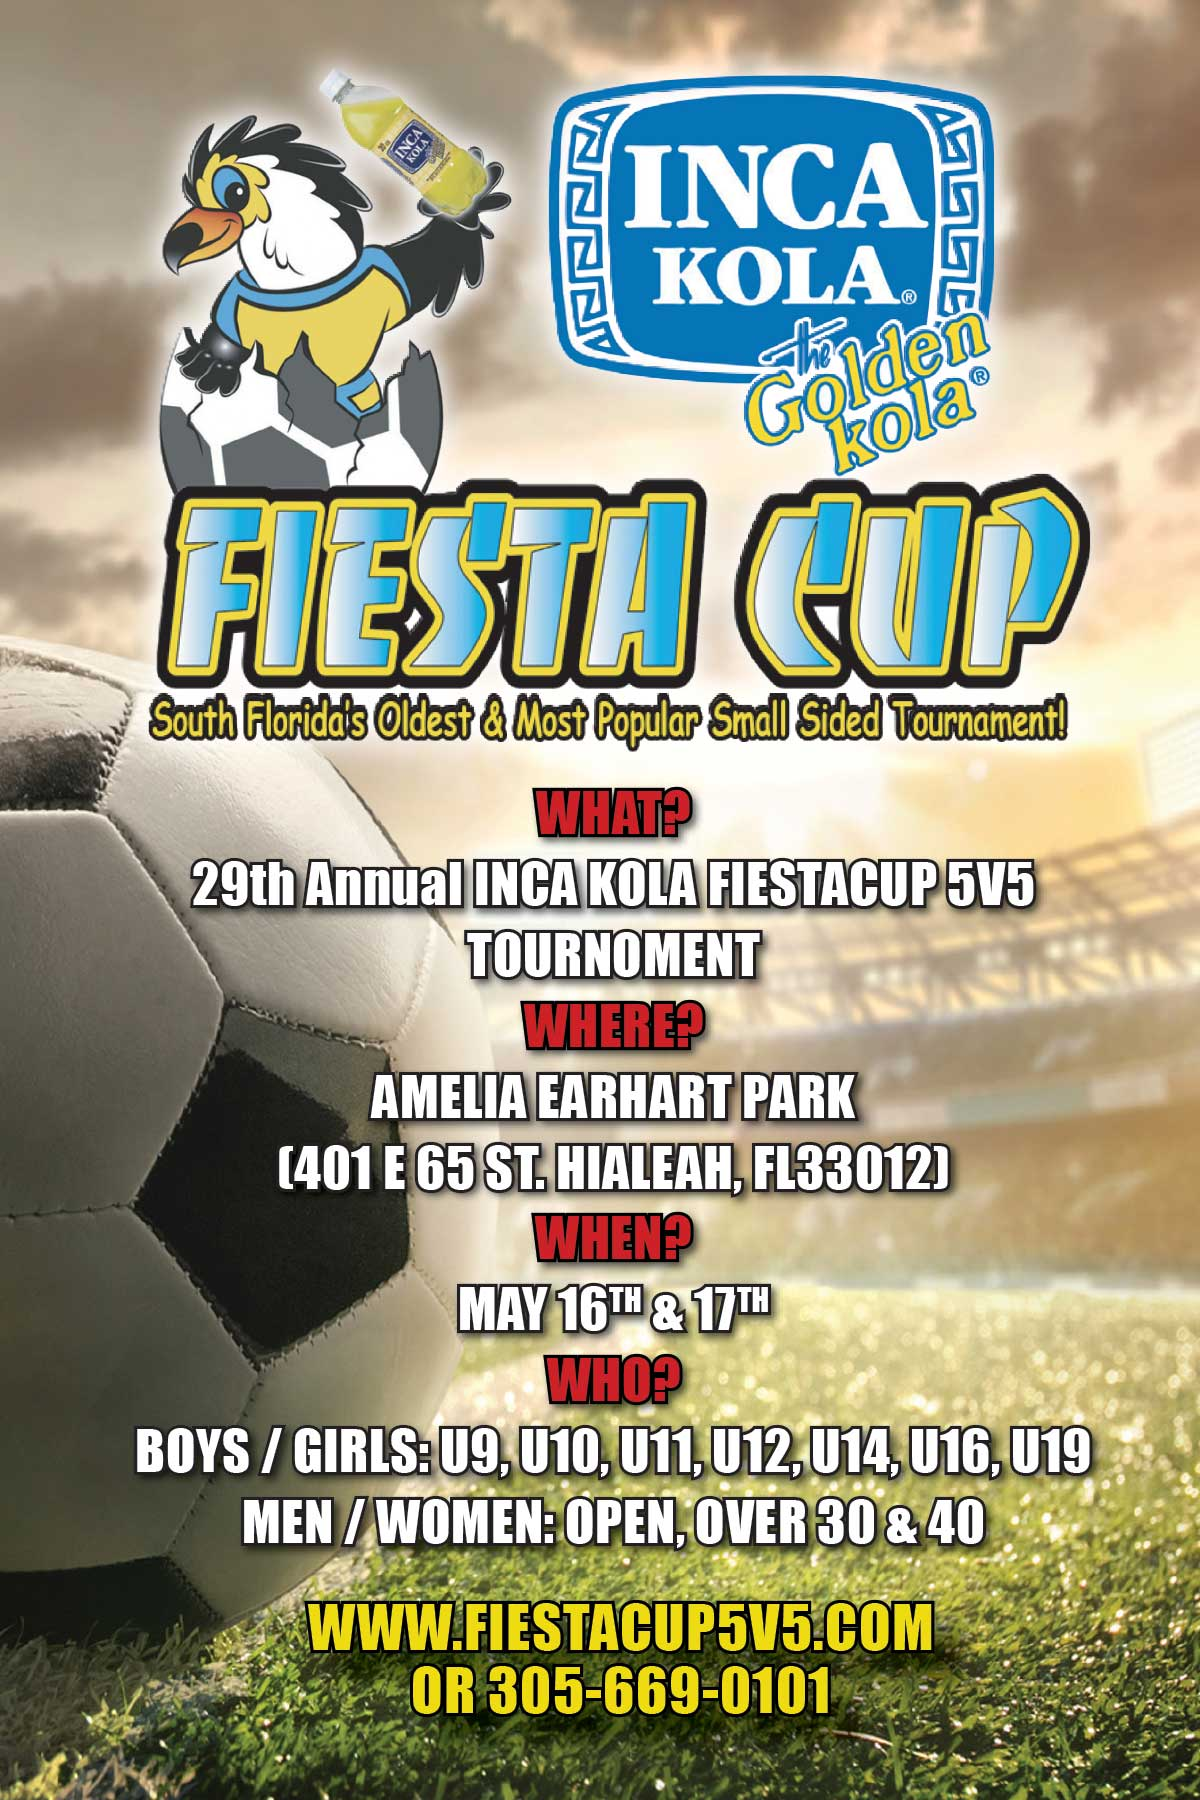 Fiesta Cup 5v5